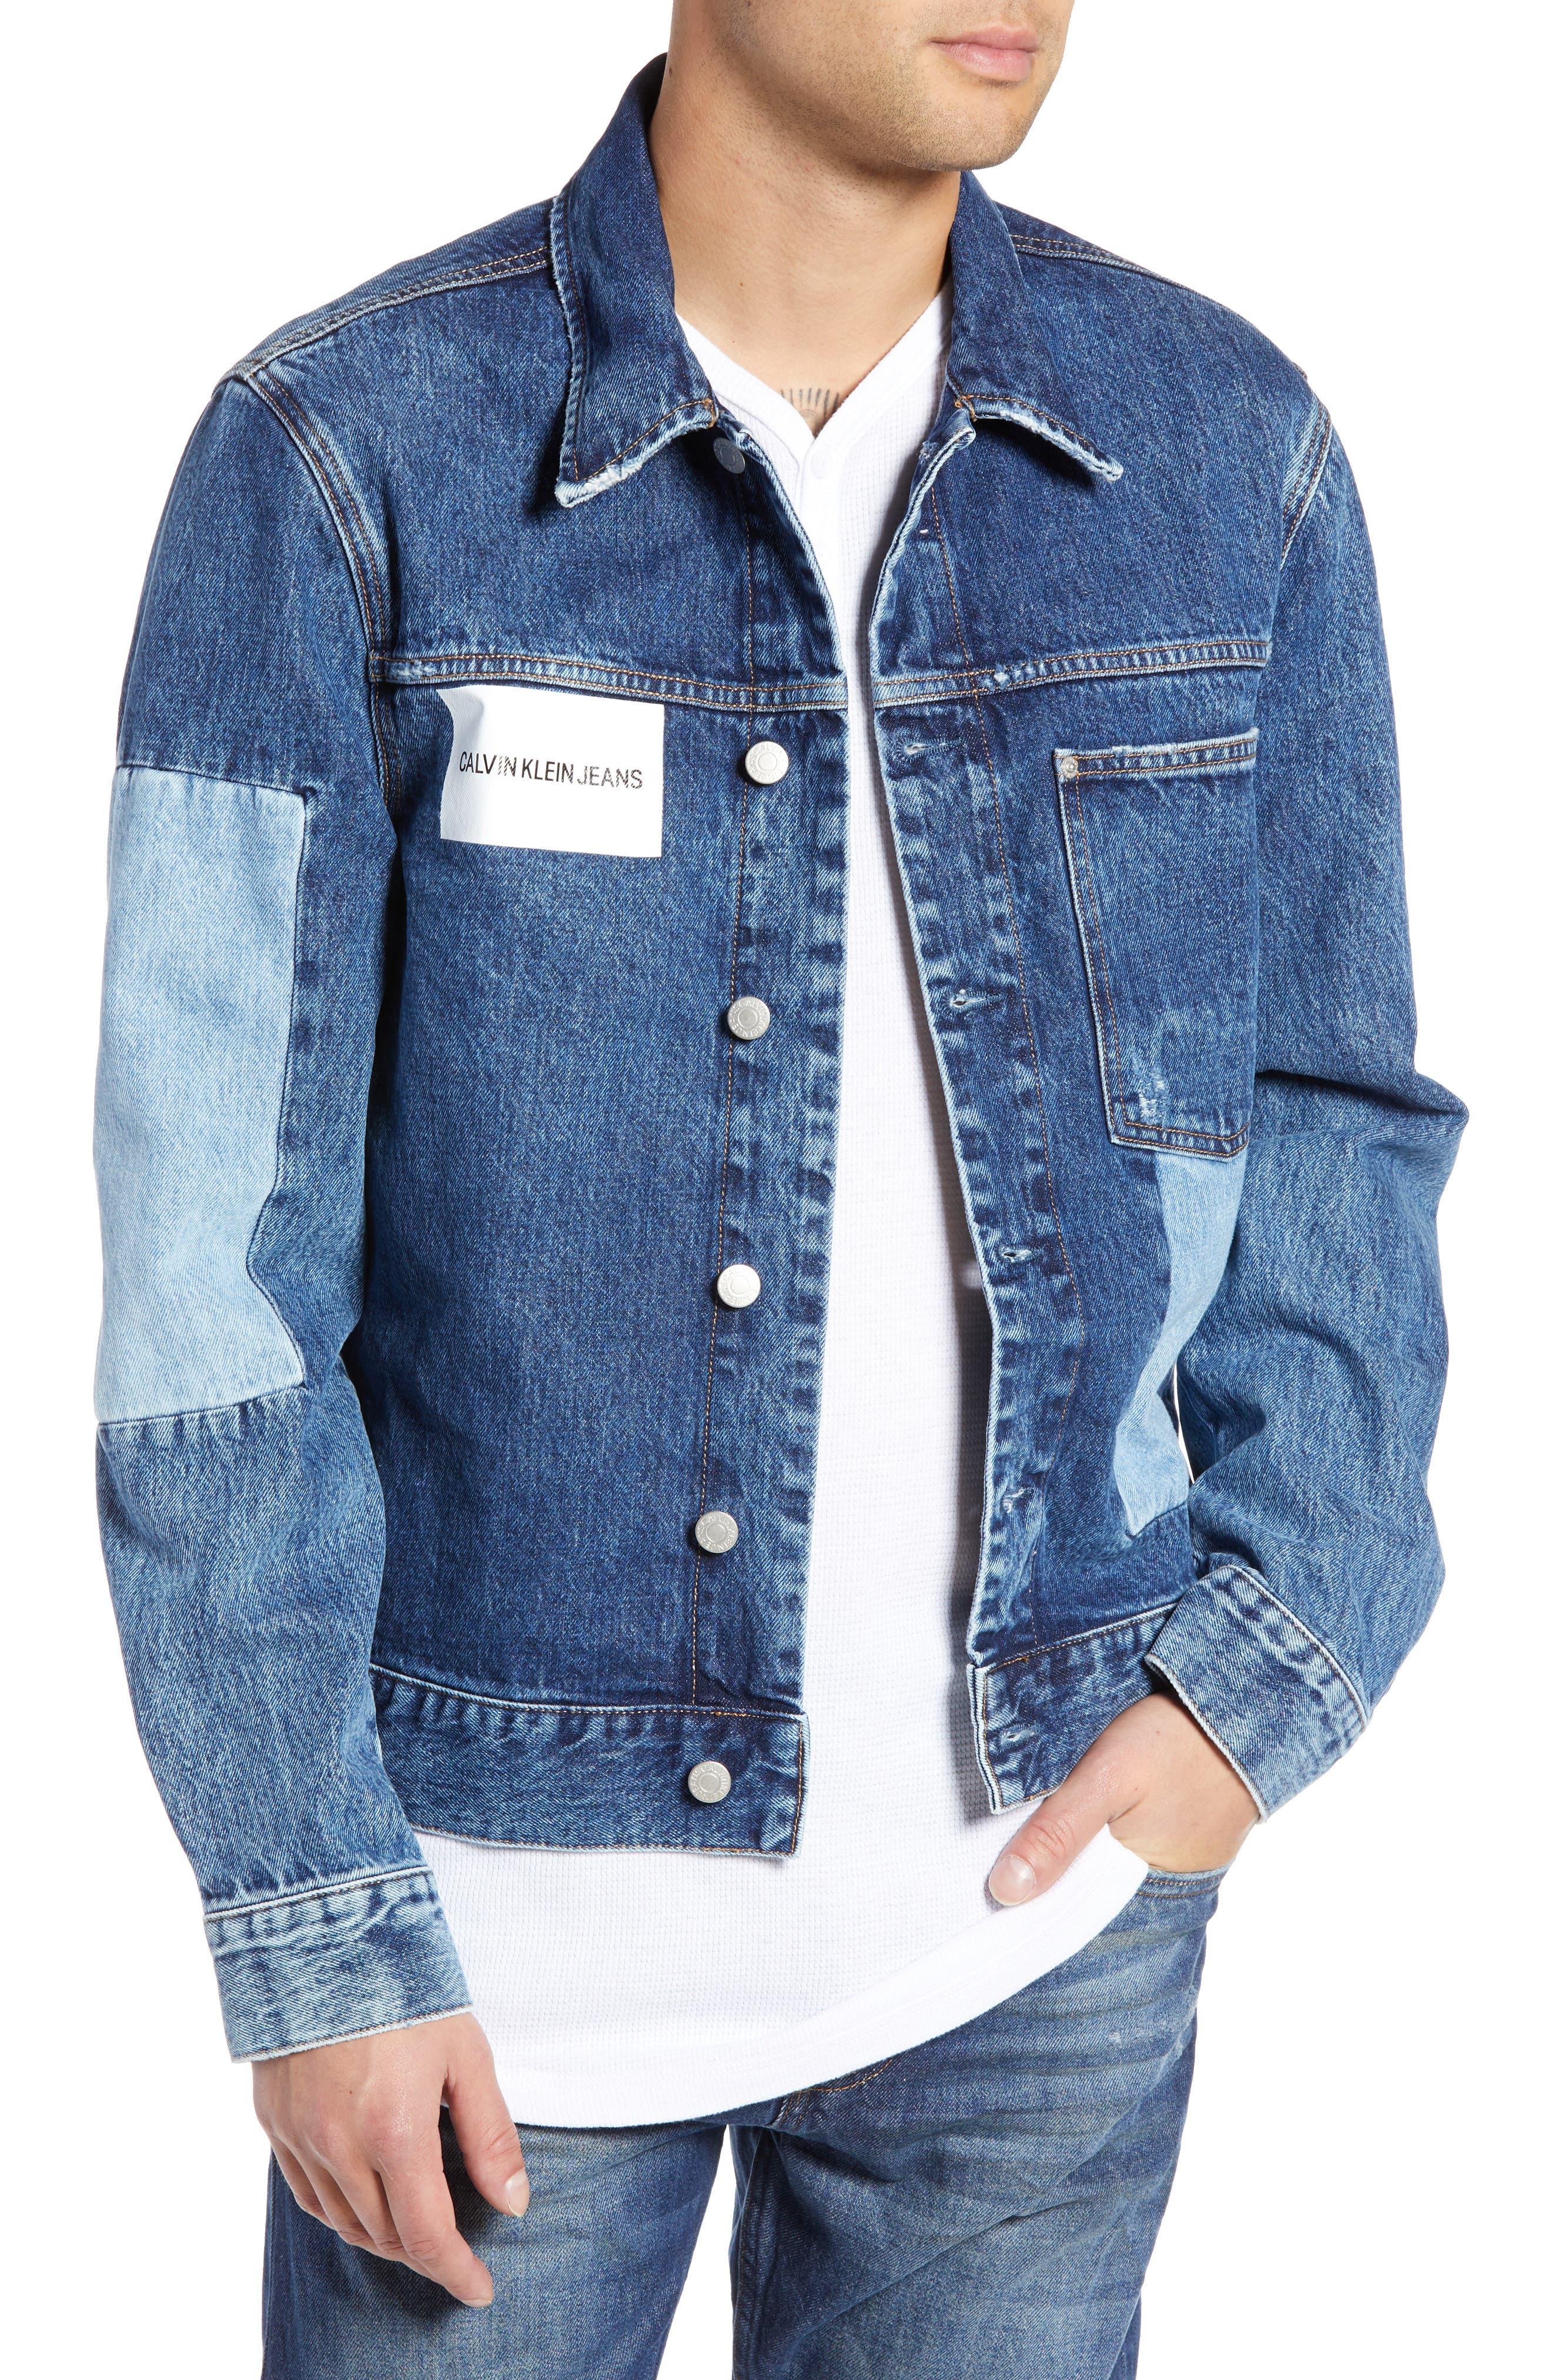 CALVIN KLEIN JEANS Patch One-Pocket Denim Jacket, Main, color, 400